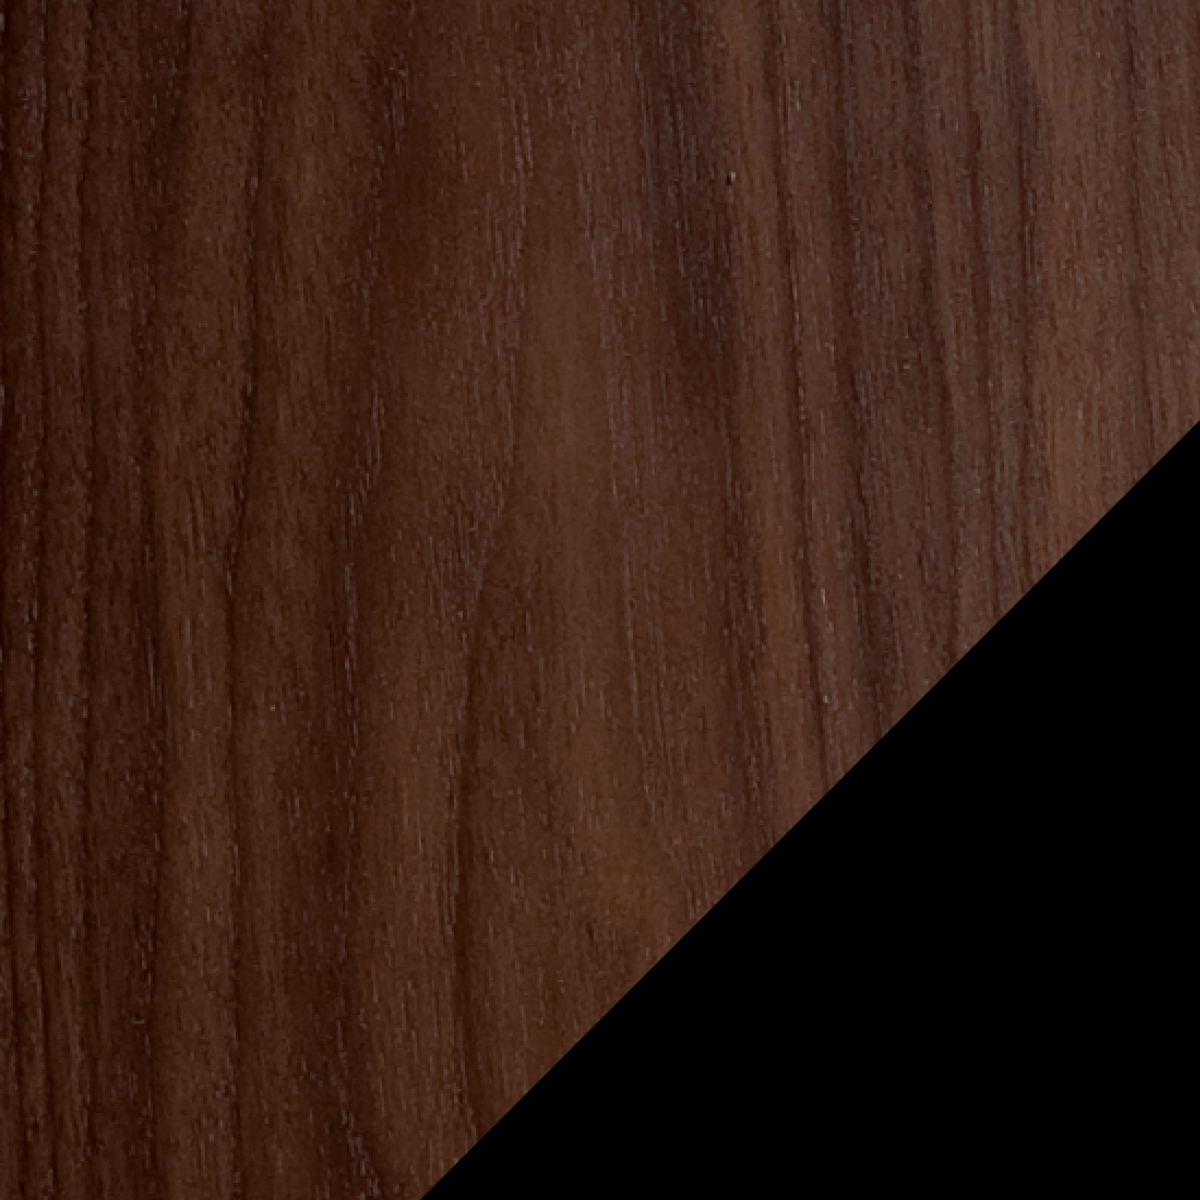 Chocolate Walnut / Black